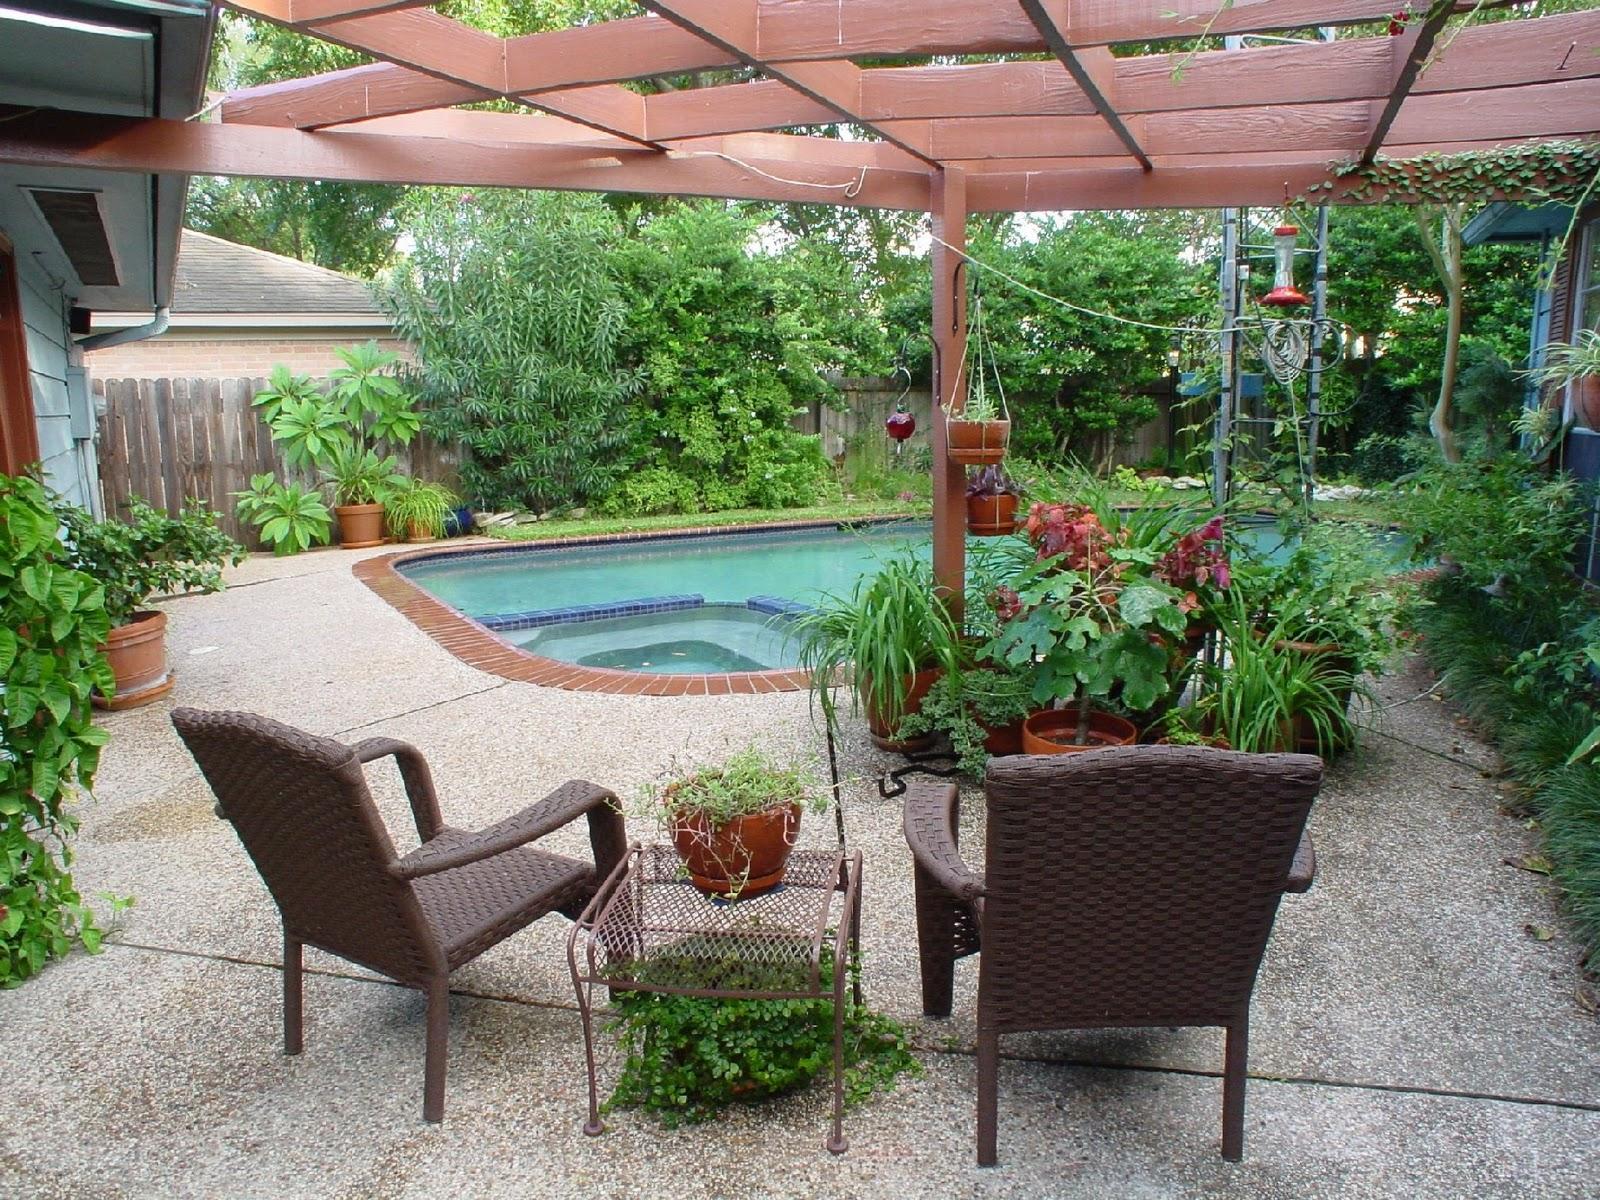 mobiliario jardim area:Use para seu beneficio um jardim junto à sua piscina.